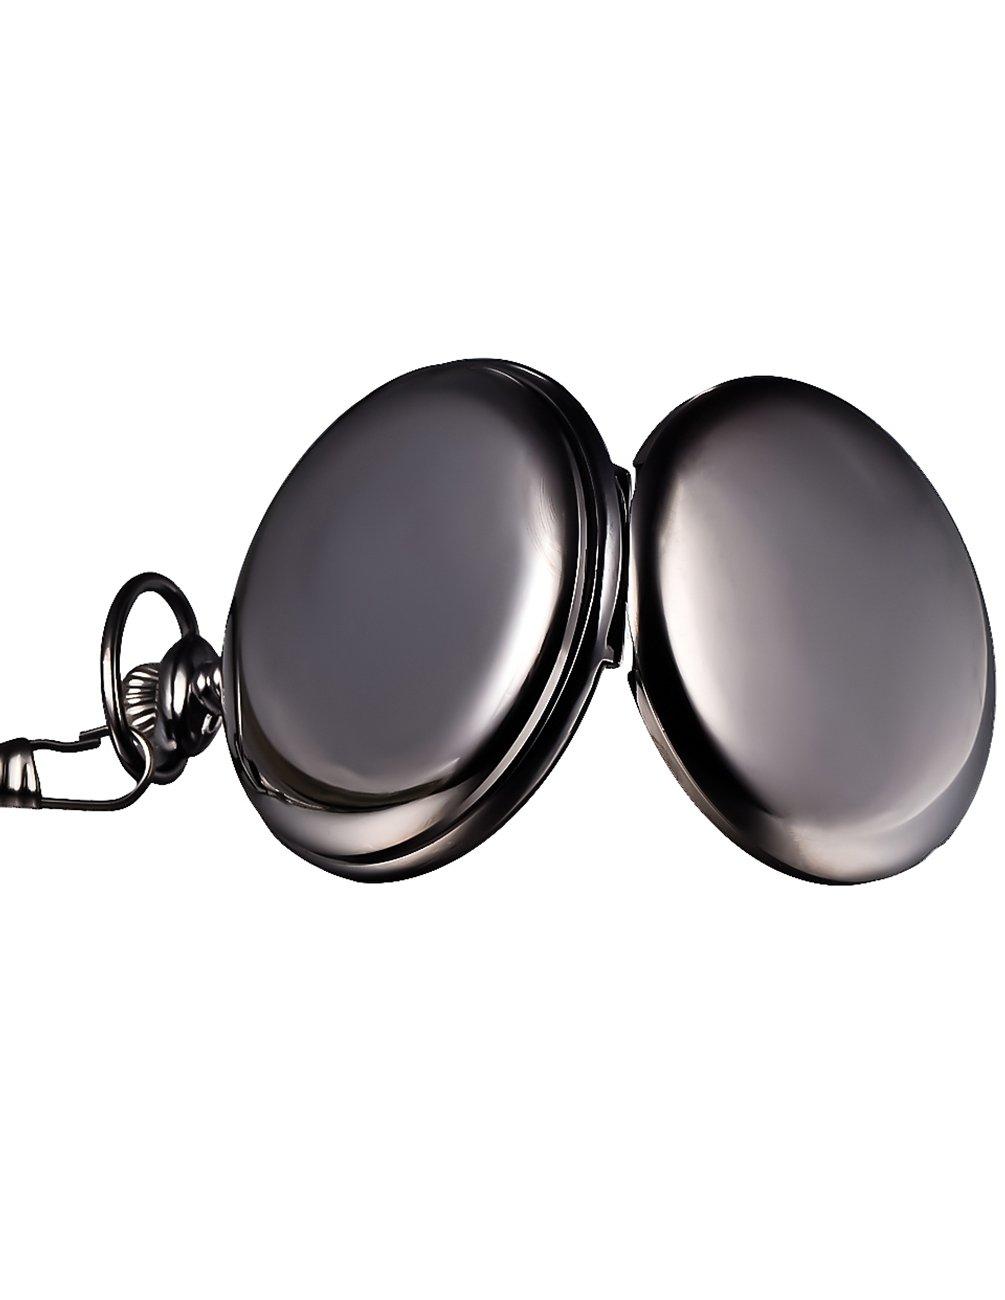 Mudder Classic Smooth Vintage Black Steel Mens Pocket Watch 4